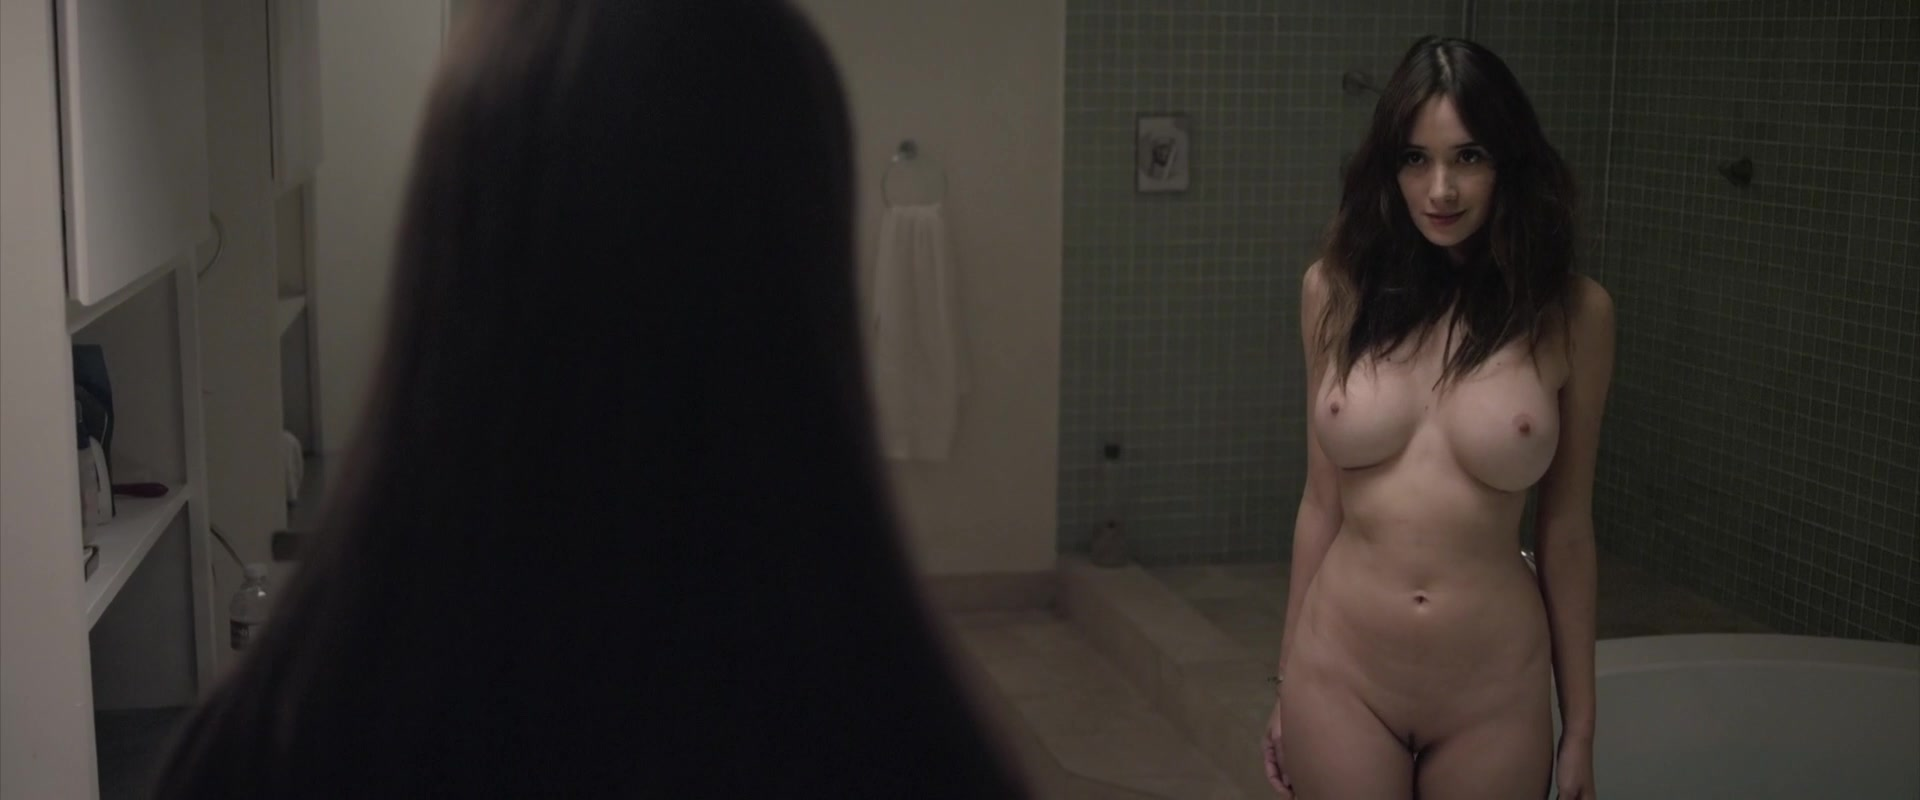 Sara malakul nude wet